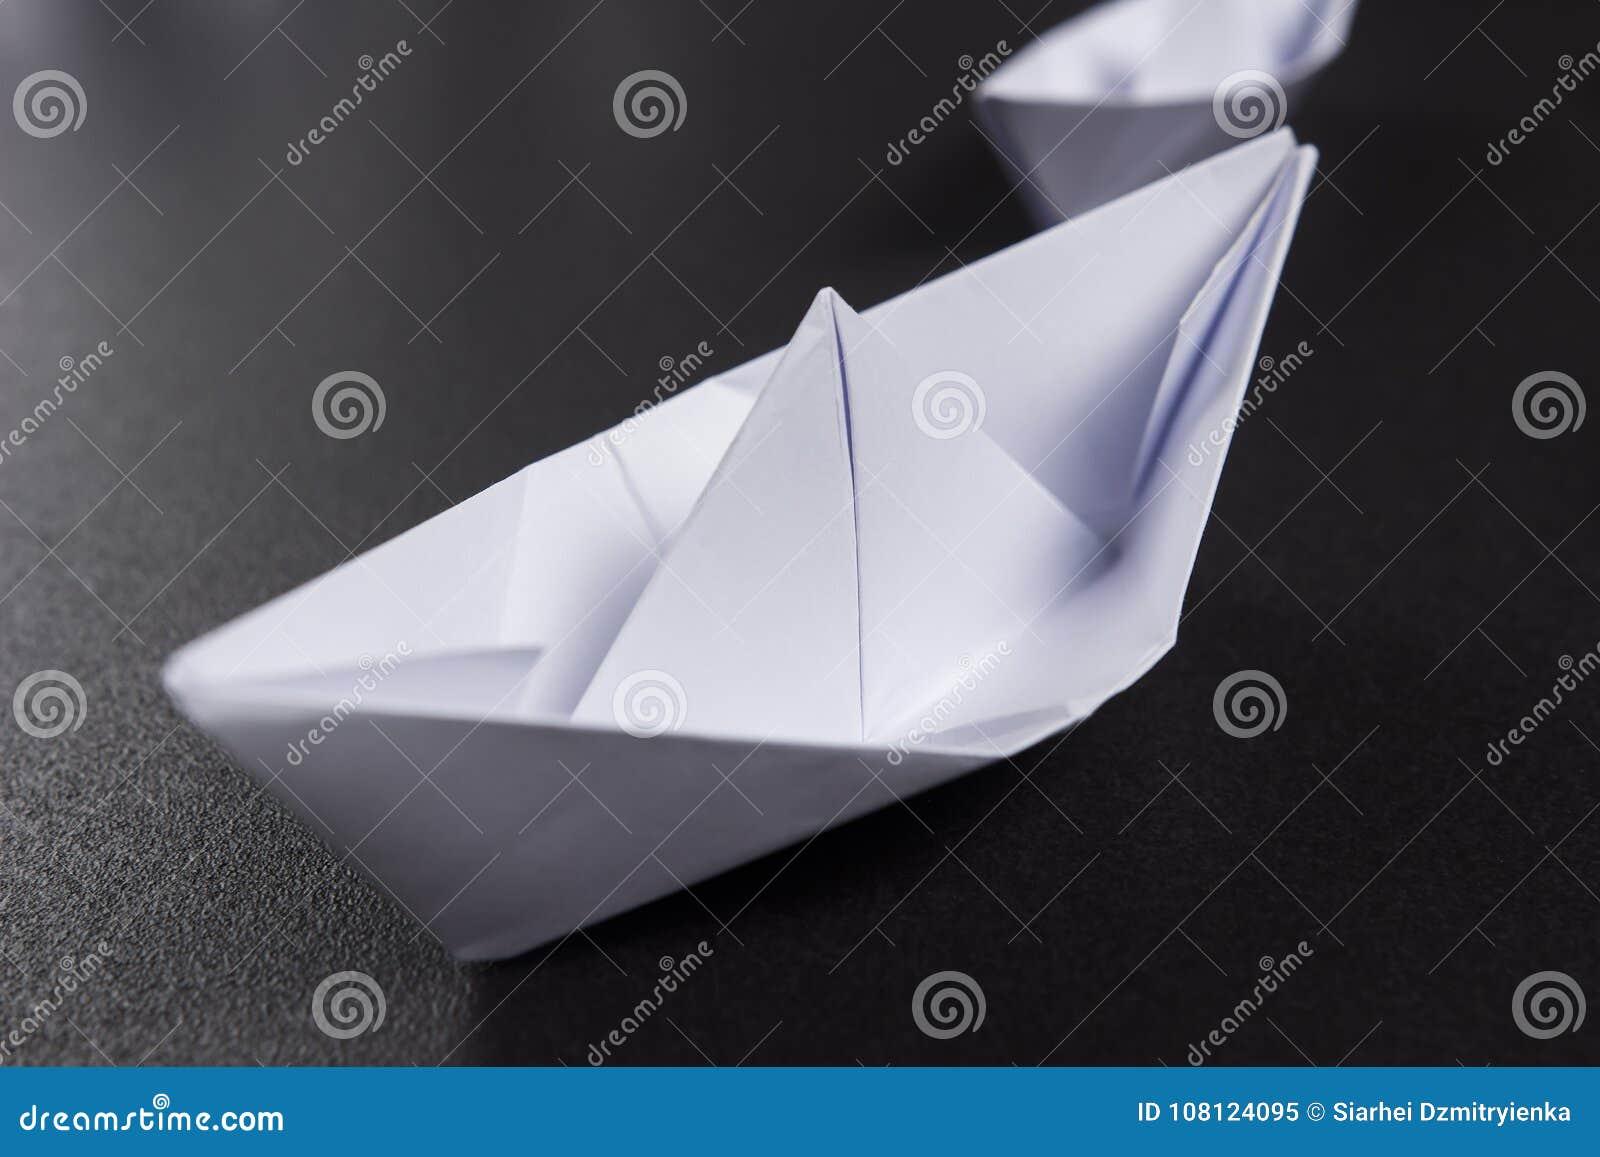 Origami Instructions | Origami Way | 957x1300